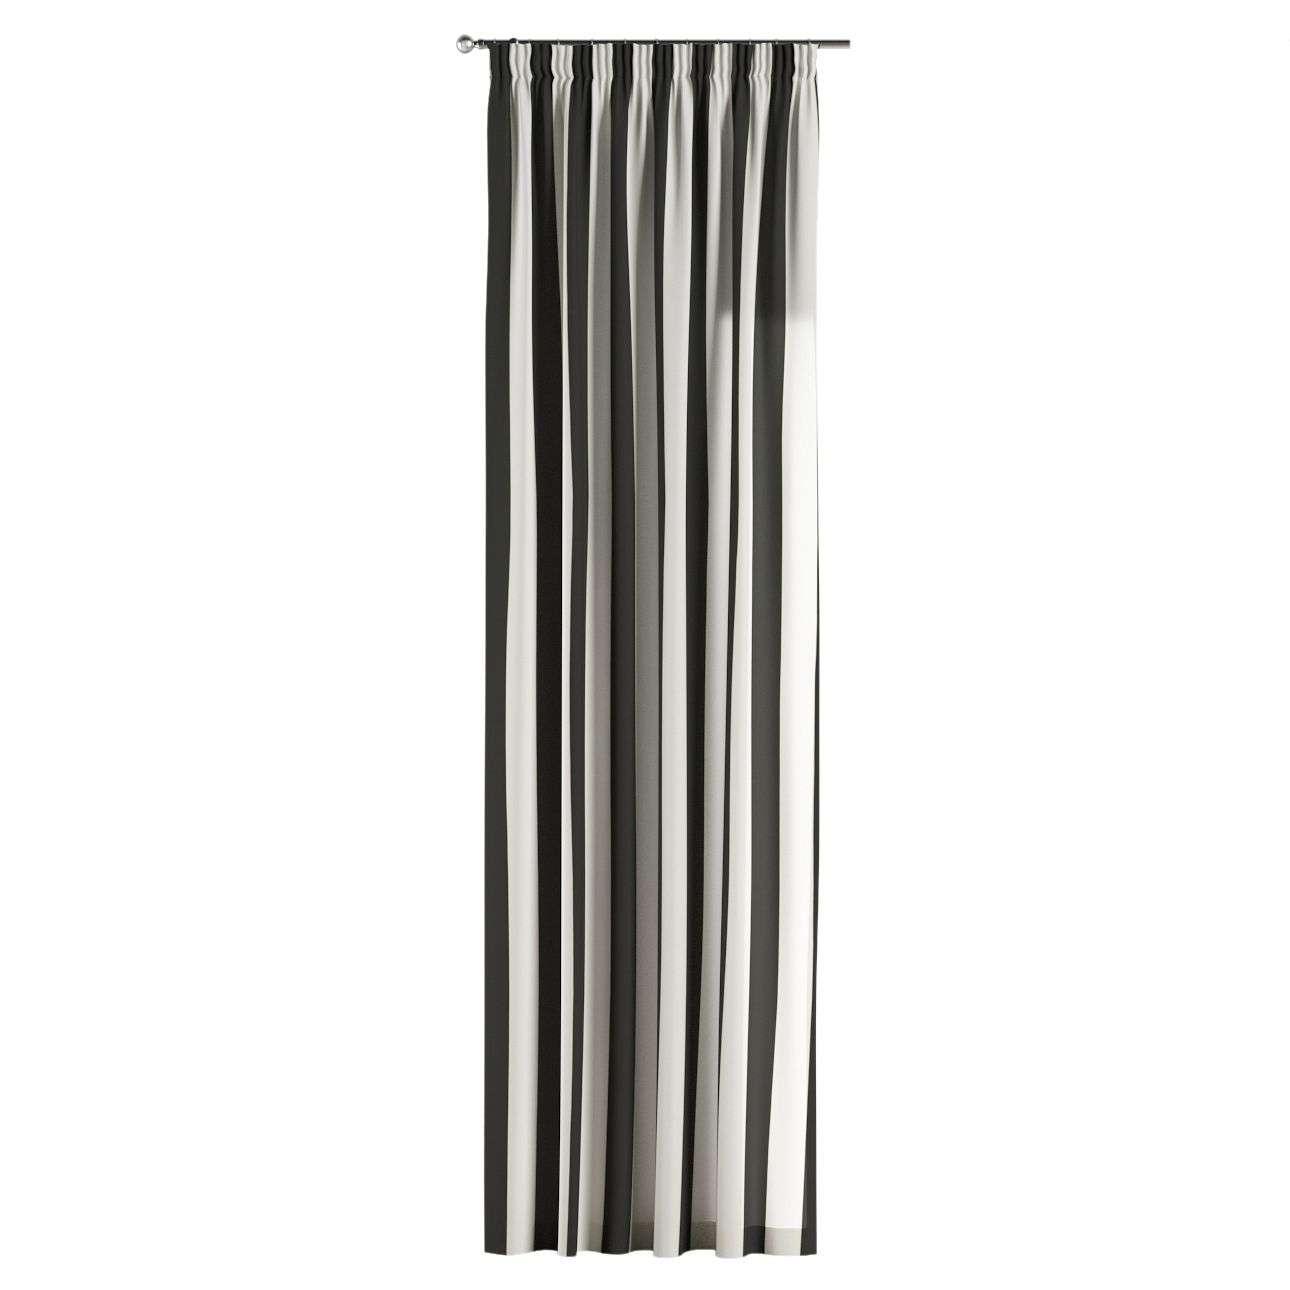 Gardin med rynkebånd 130 x 260 cm fra kollektionen Comics, Stof: 137-53